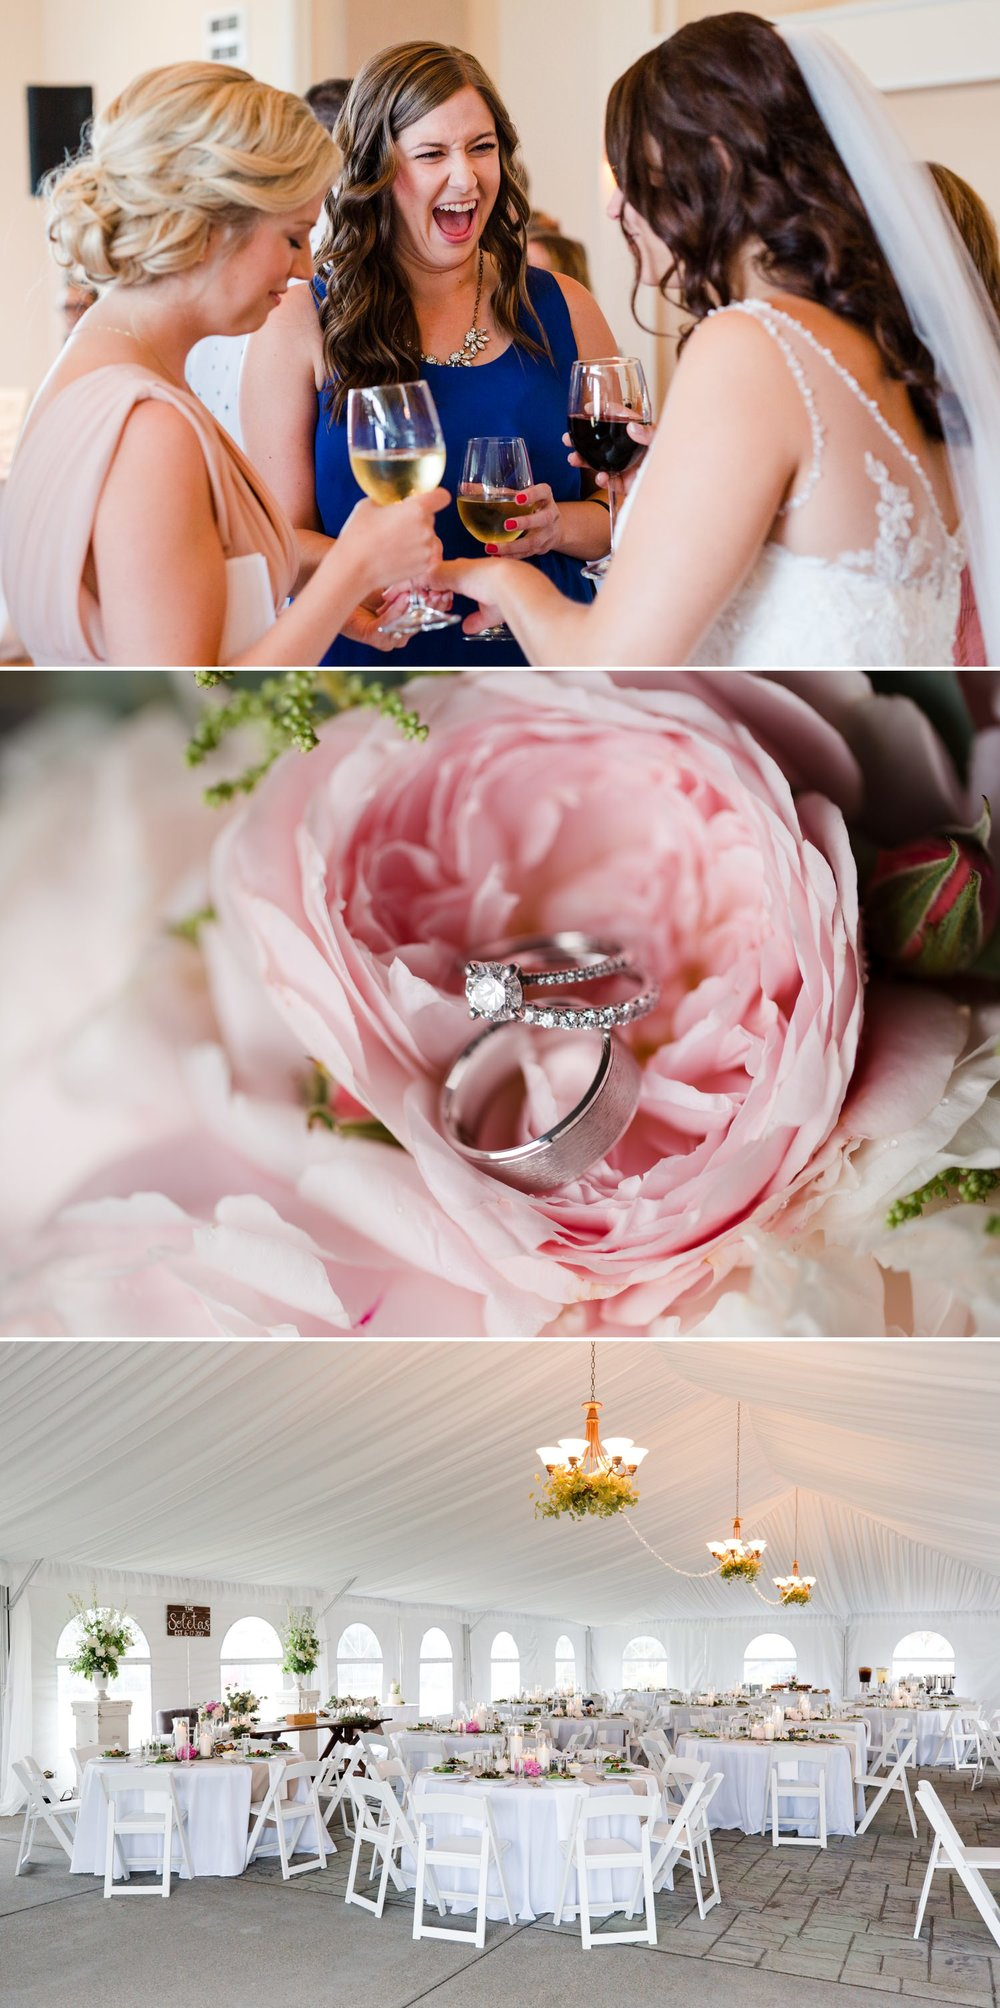 25-hood-canal-vista-pavilion-wedding-reception.jpg